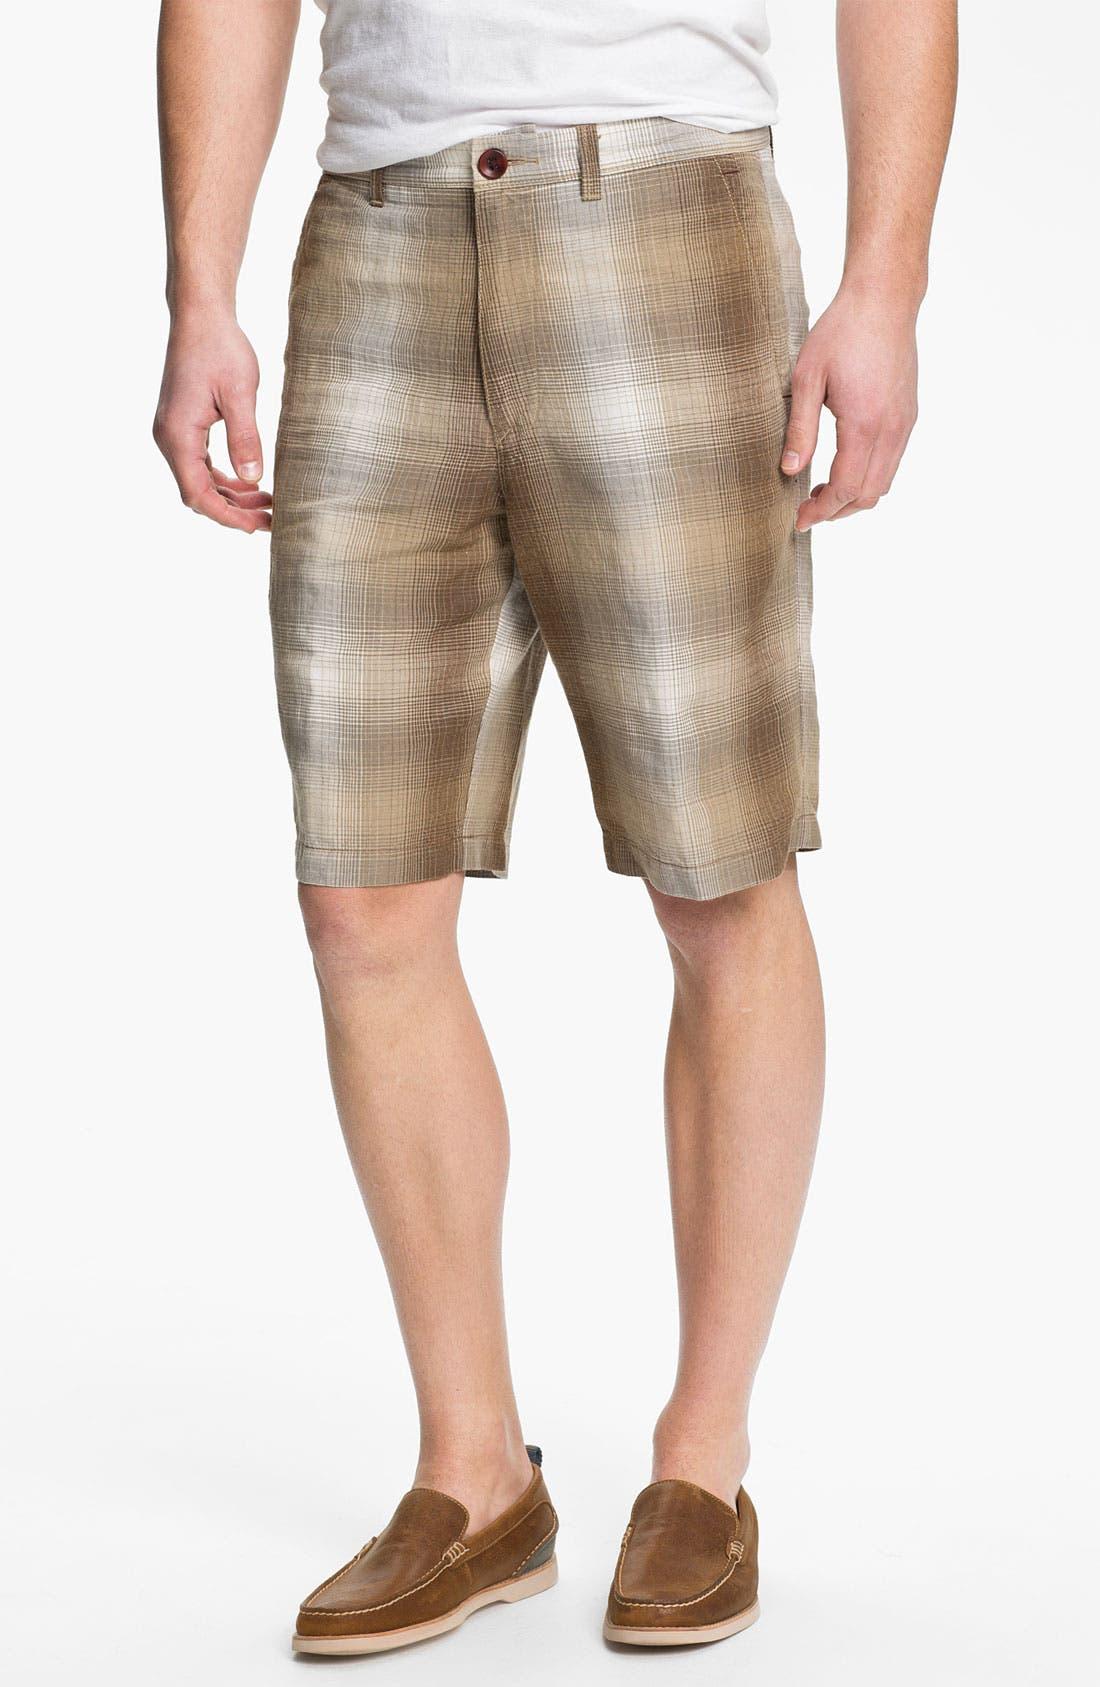 Alternate Image 1 Selected - Tommy Bahama 'Balken' Plaid Shorts